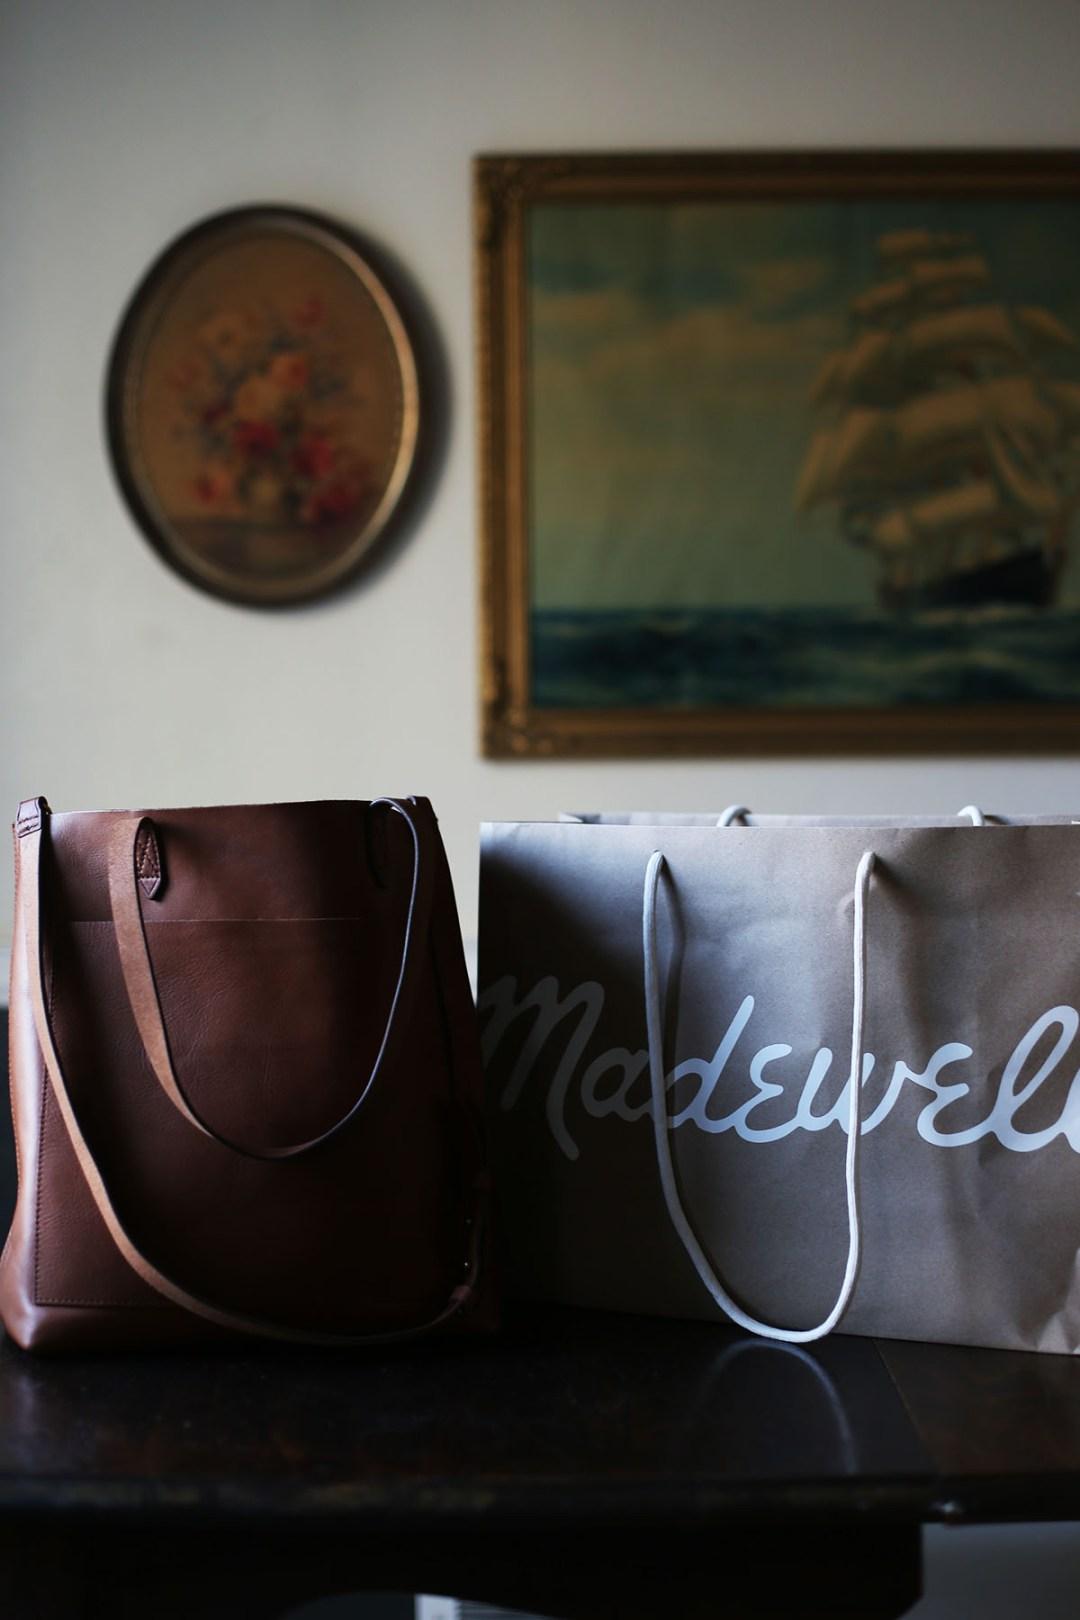 My favorite madewell bag